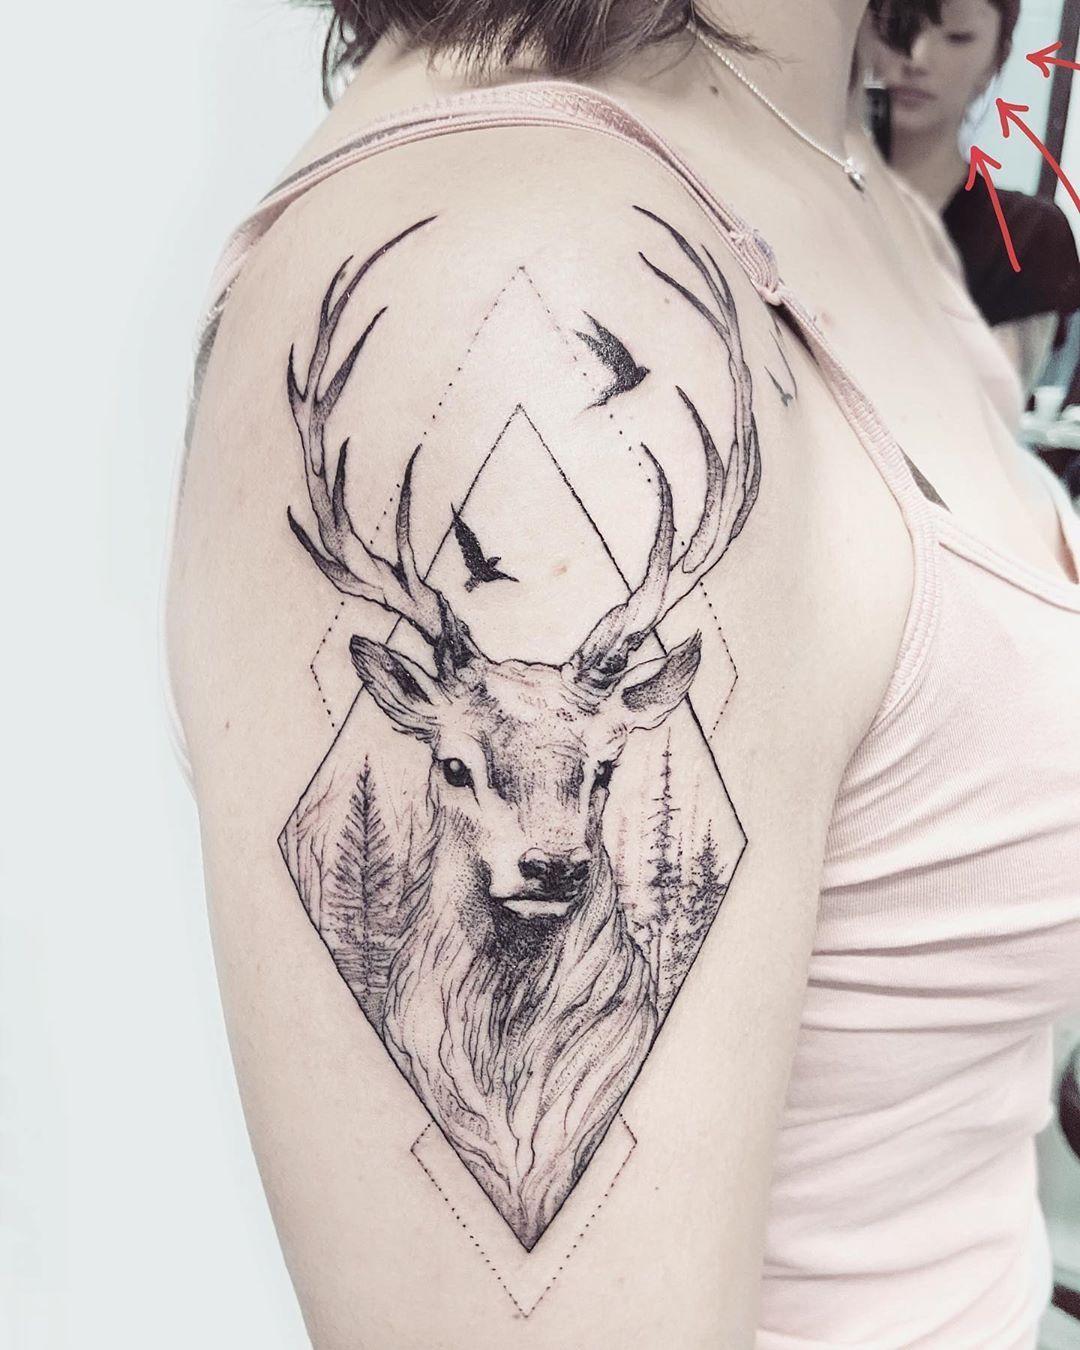 1 o 2? 😍 Cervo e lupo 🌿 Per la coraggiosissima Rebecca • • • •  #tattoo#tattooagogo#ink#inked#tattooedgirls#tattoodesign#tattooer#art#artist#tattooedgirl#tattoodesign#blackworker#blackworkers#blackworkerssubmission#dotwork#dotworktattoo#tattoogirl#delicatetattoo#minimaltattoo#dotwork#dotworktattoo#dotworkers#girlswithtattoos#tattoogirl